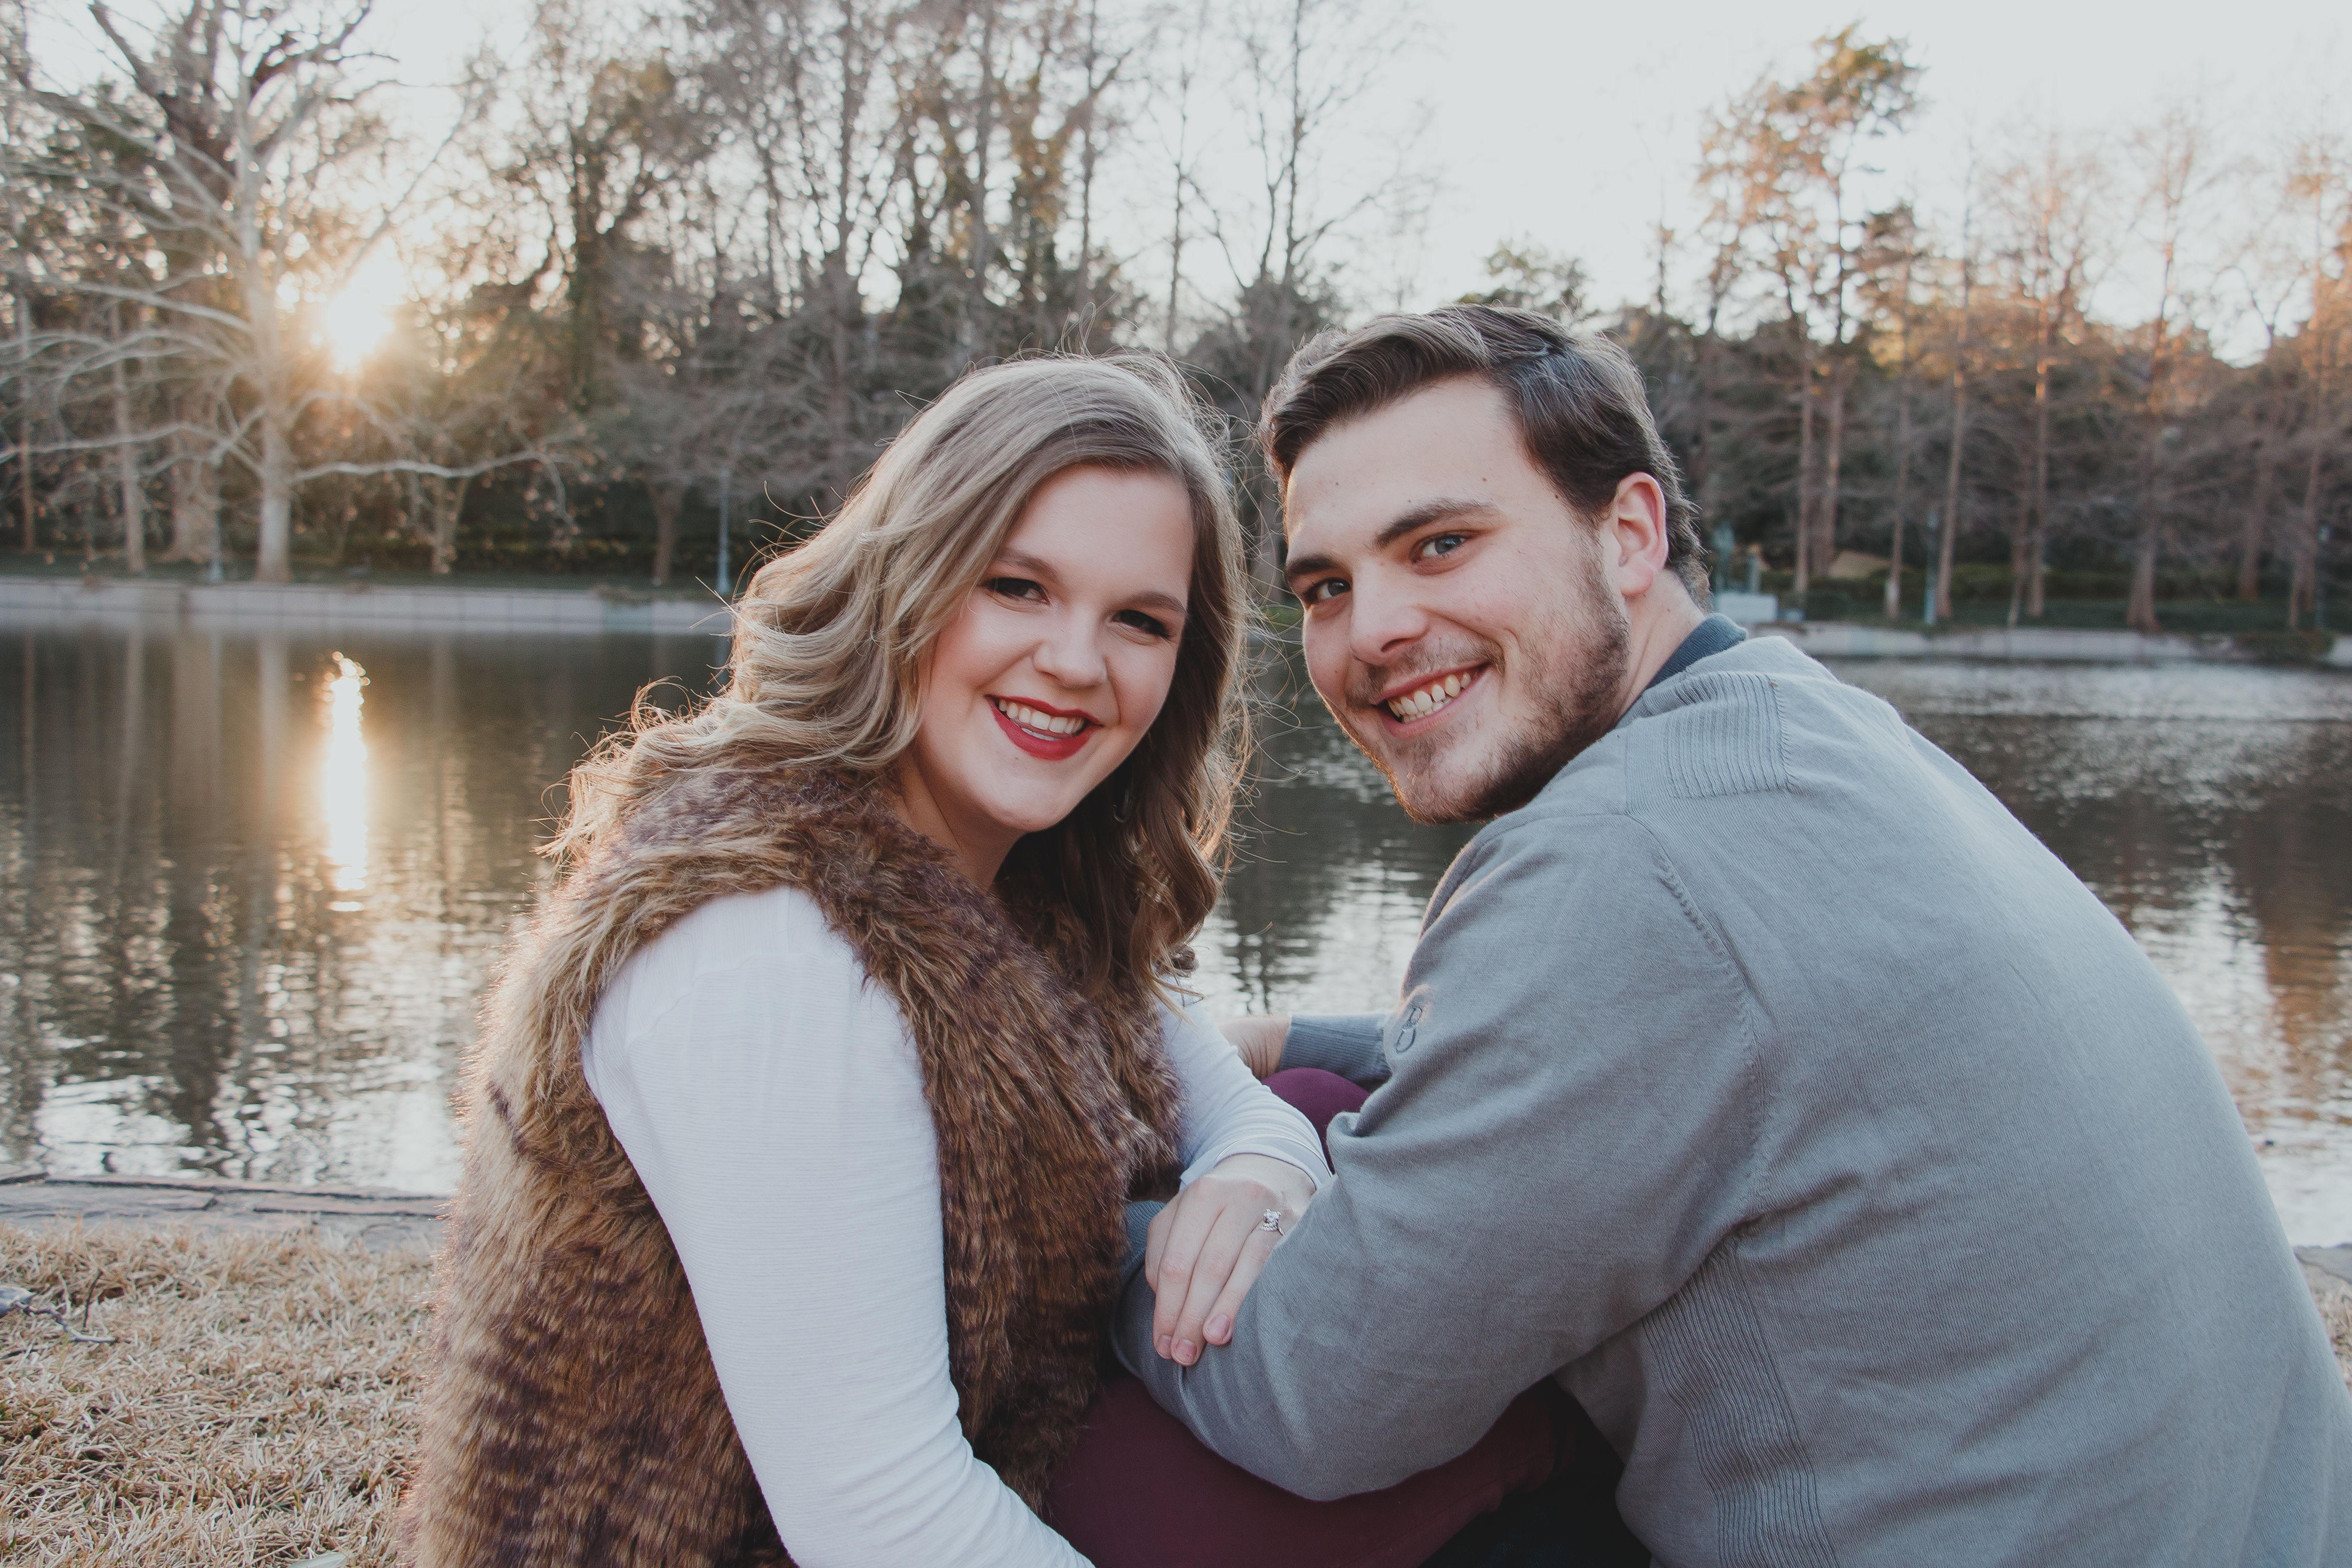 audrey and taylors wedding wedding website wedding on